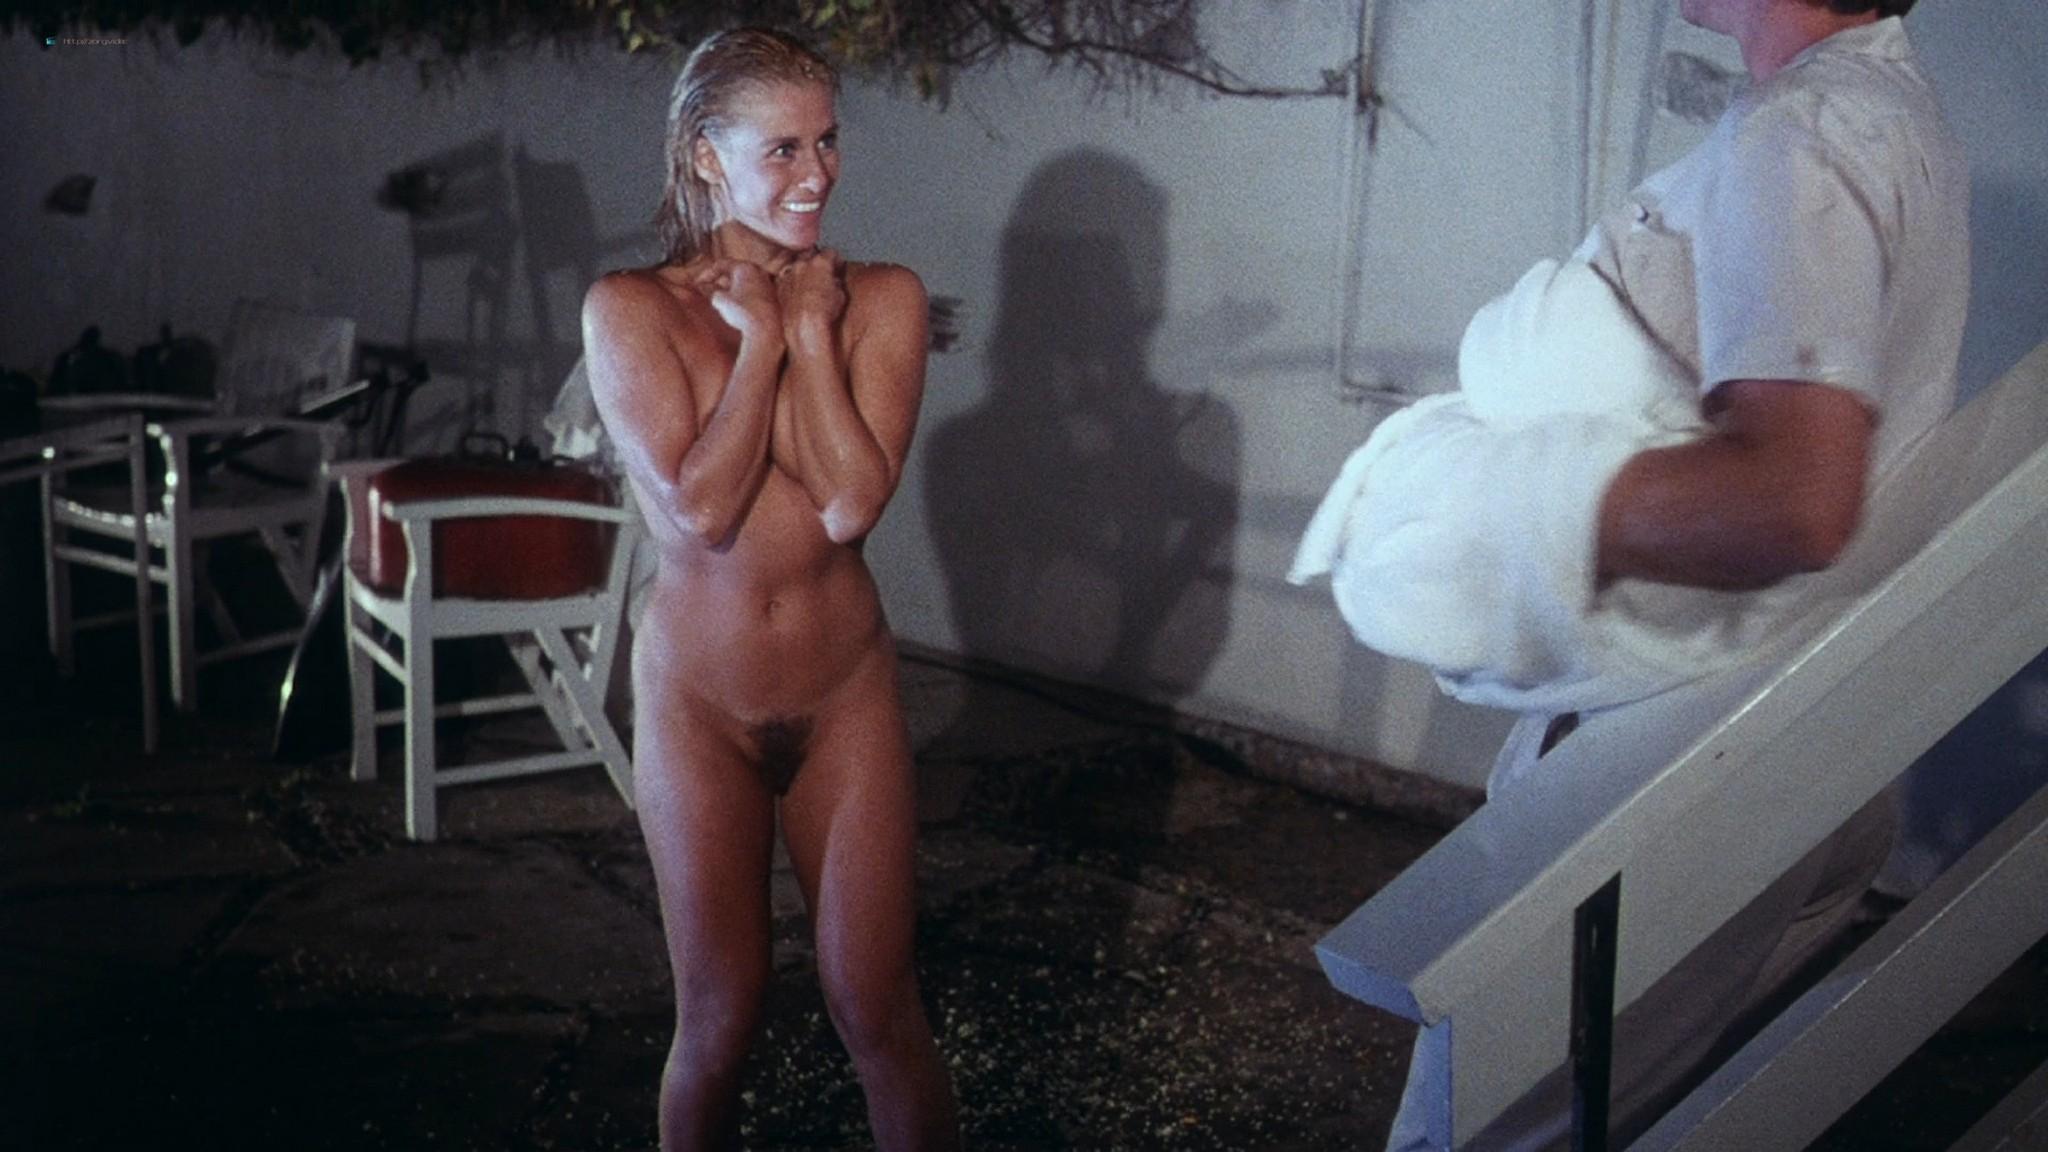 Belinda Mayne nude full frontal - White Fire (1984) HD 1080p BluRay (7)